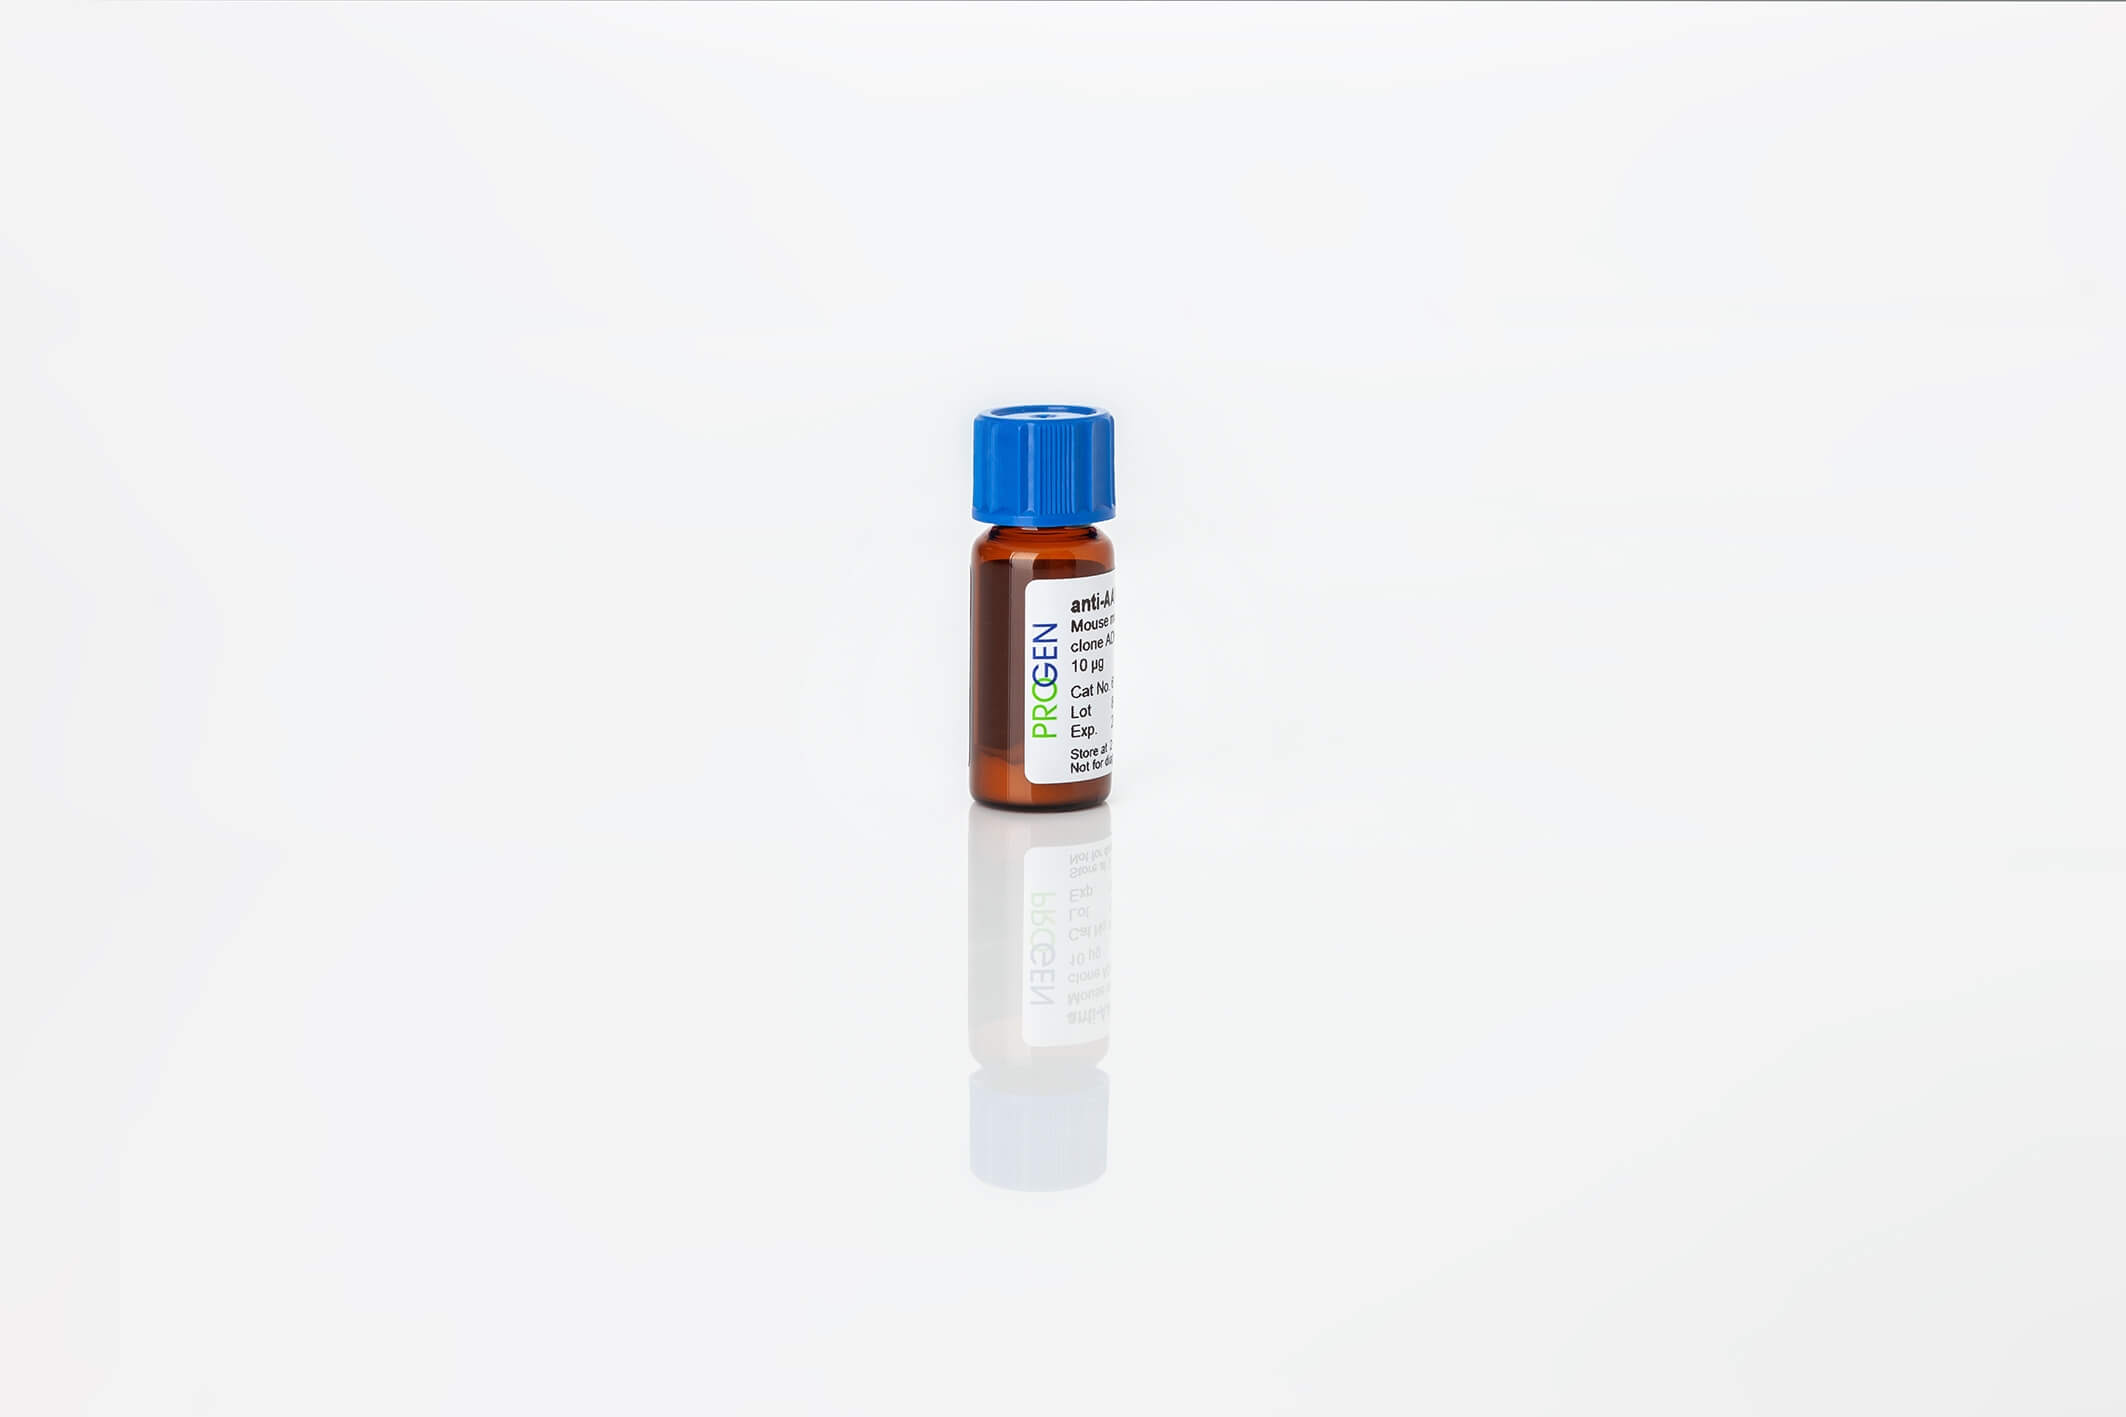 anti-Lamin mouse monoclonal, X67, lyophilized, purified